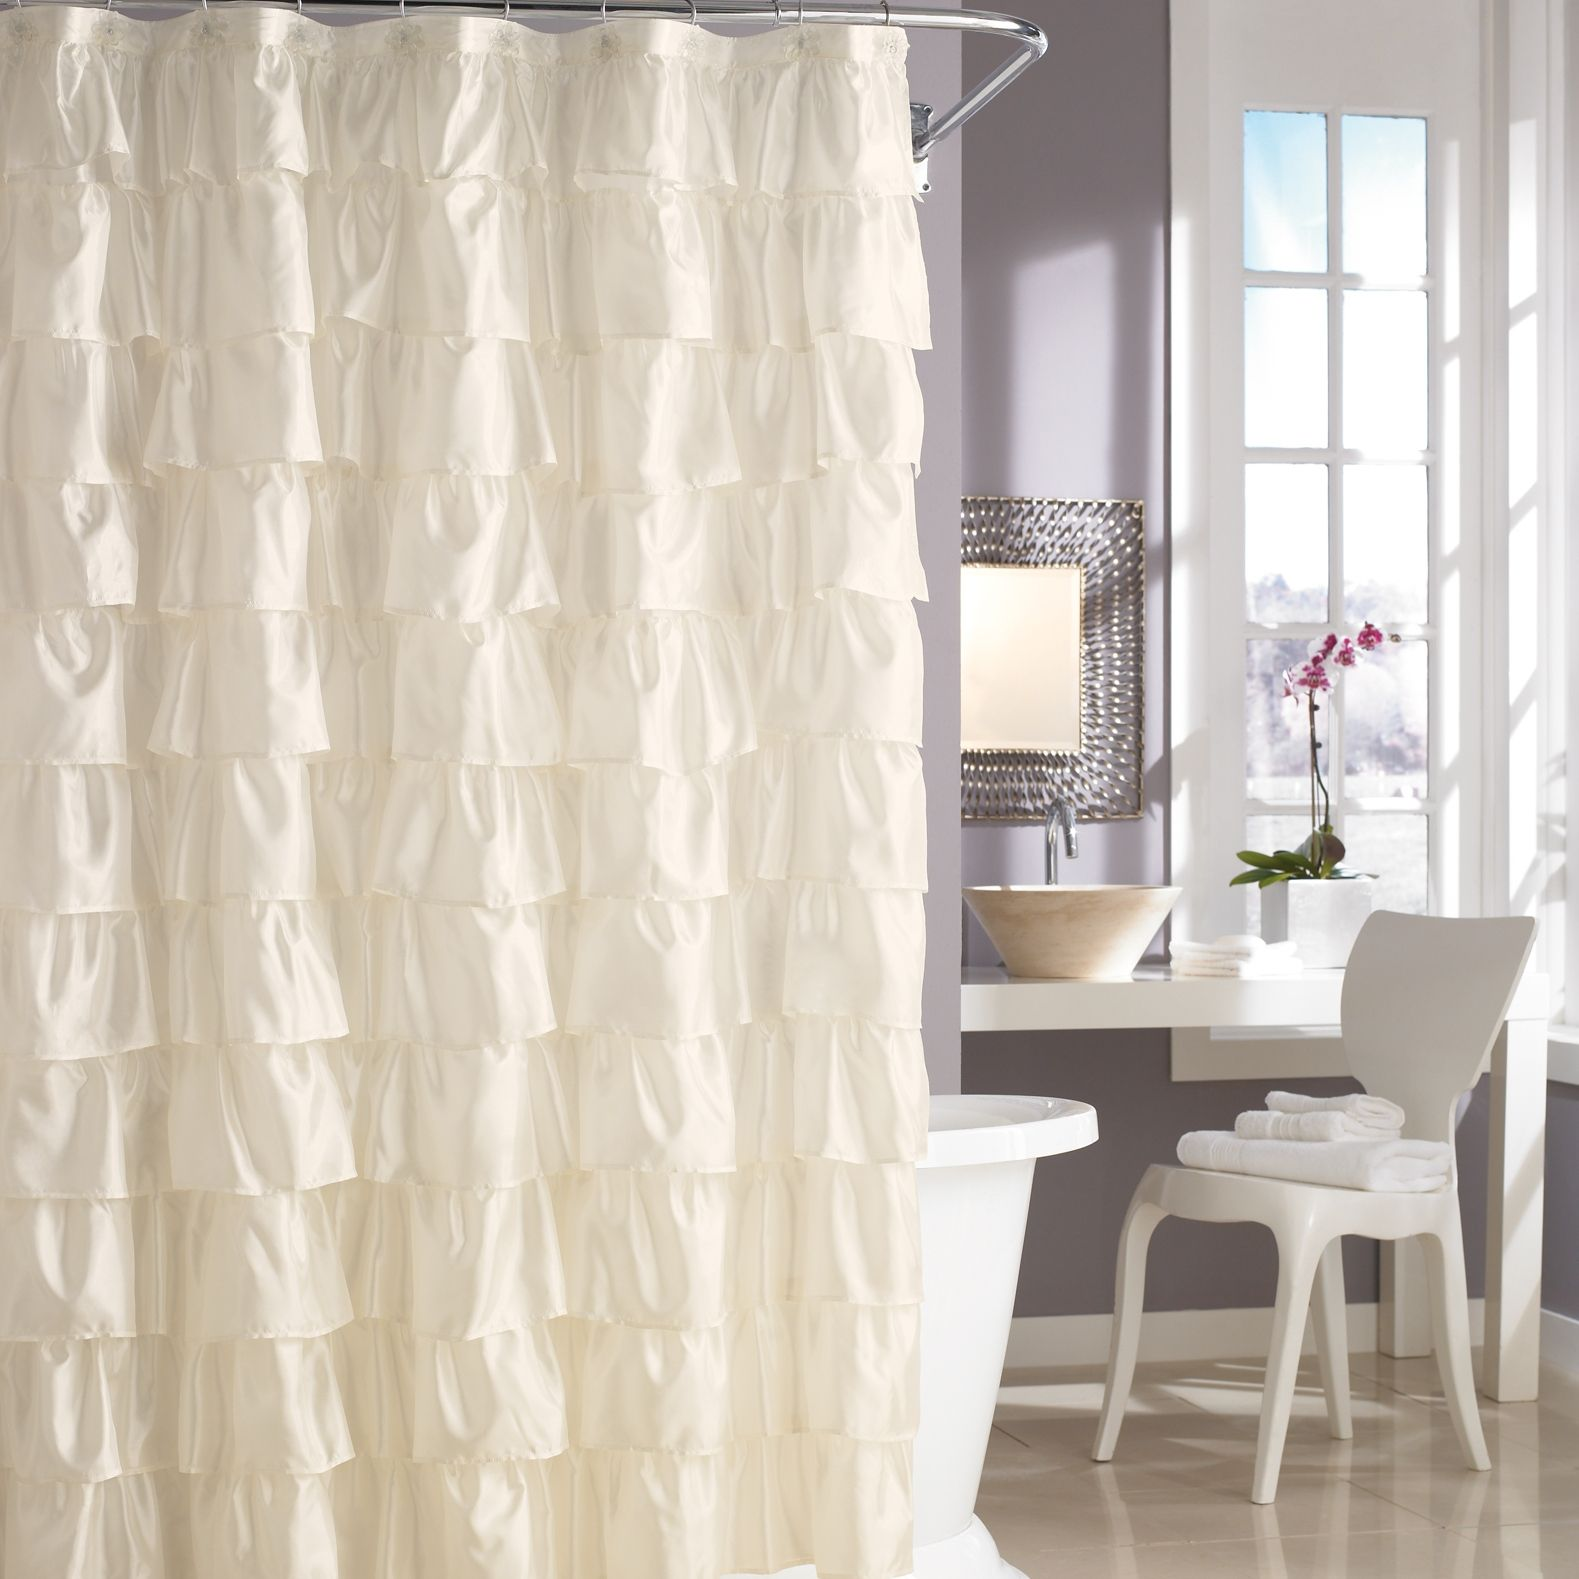 Steve Madden shower curtain?! $29.99 | La Maison ...